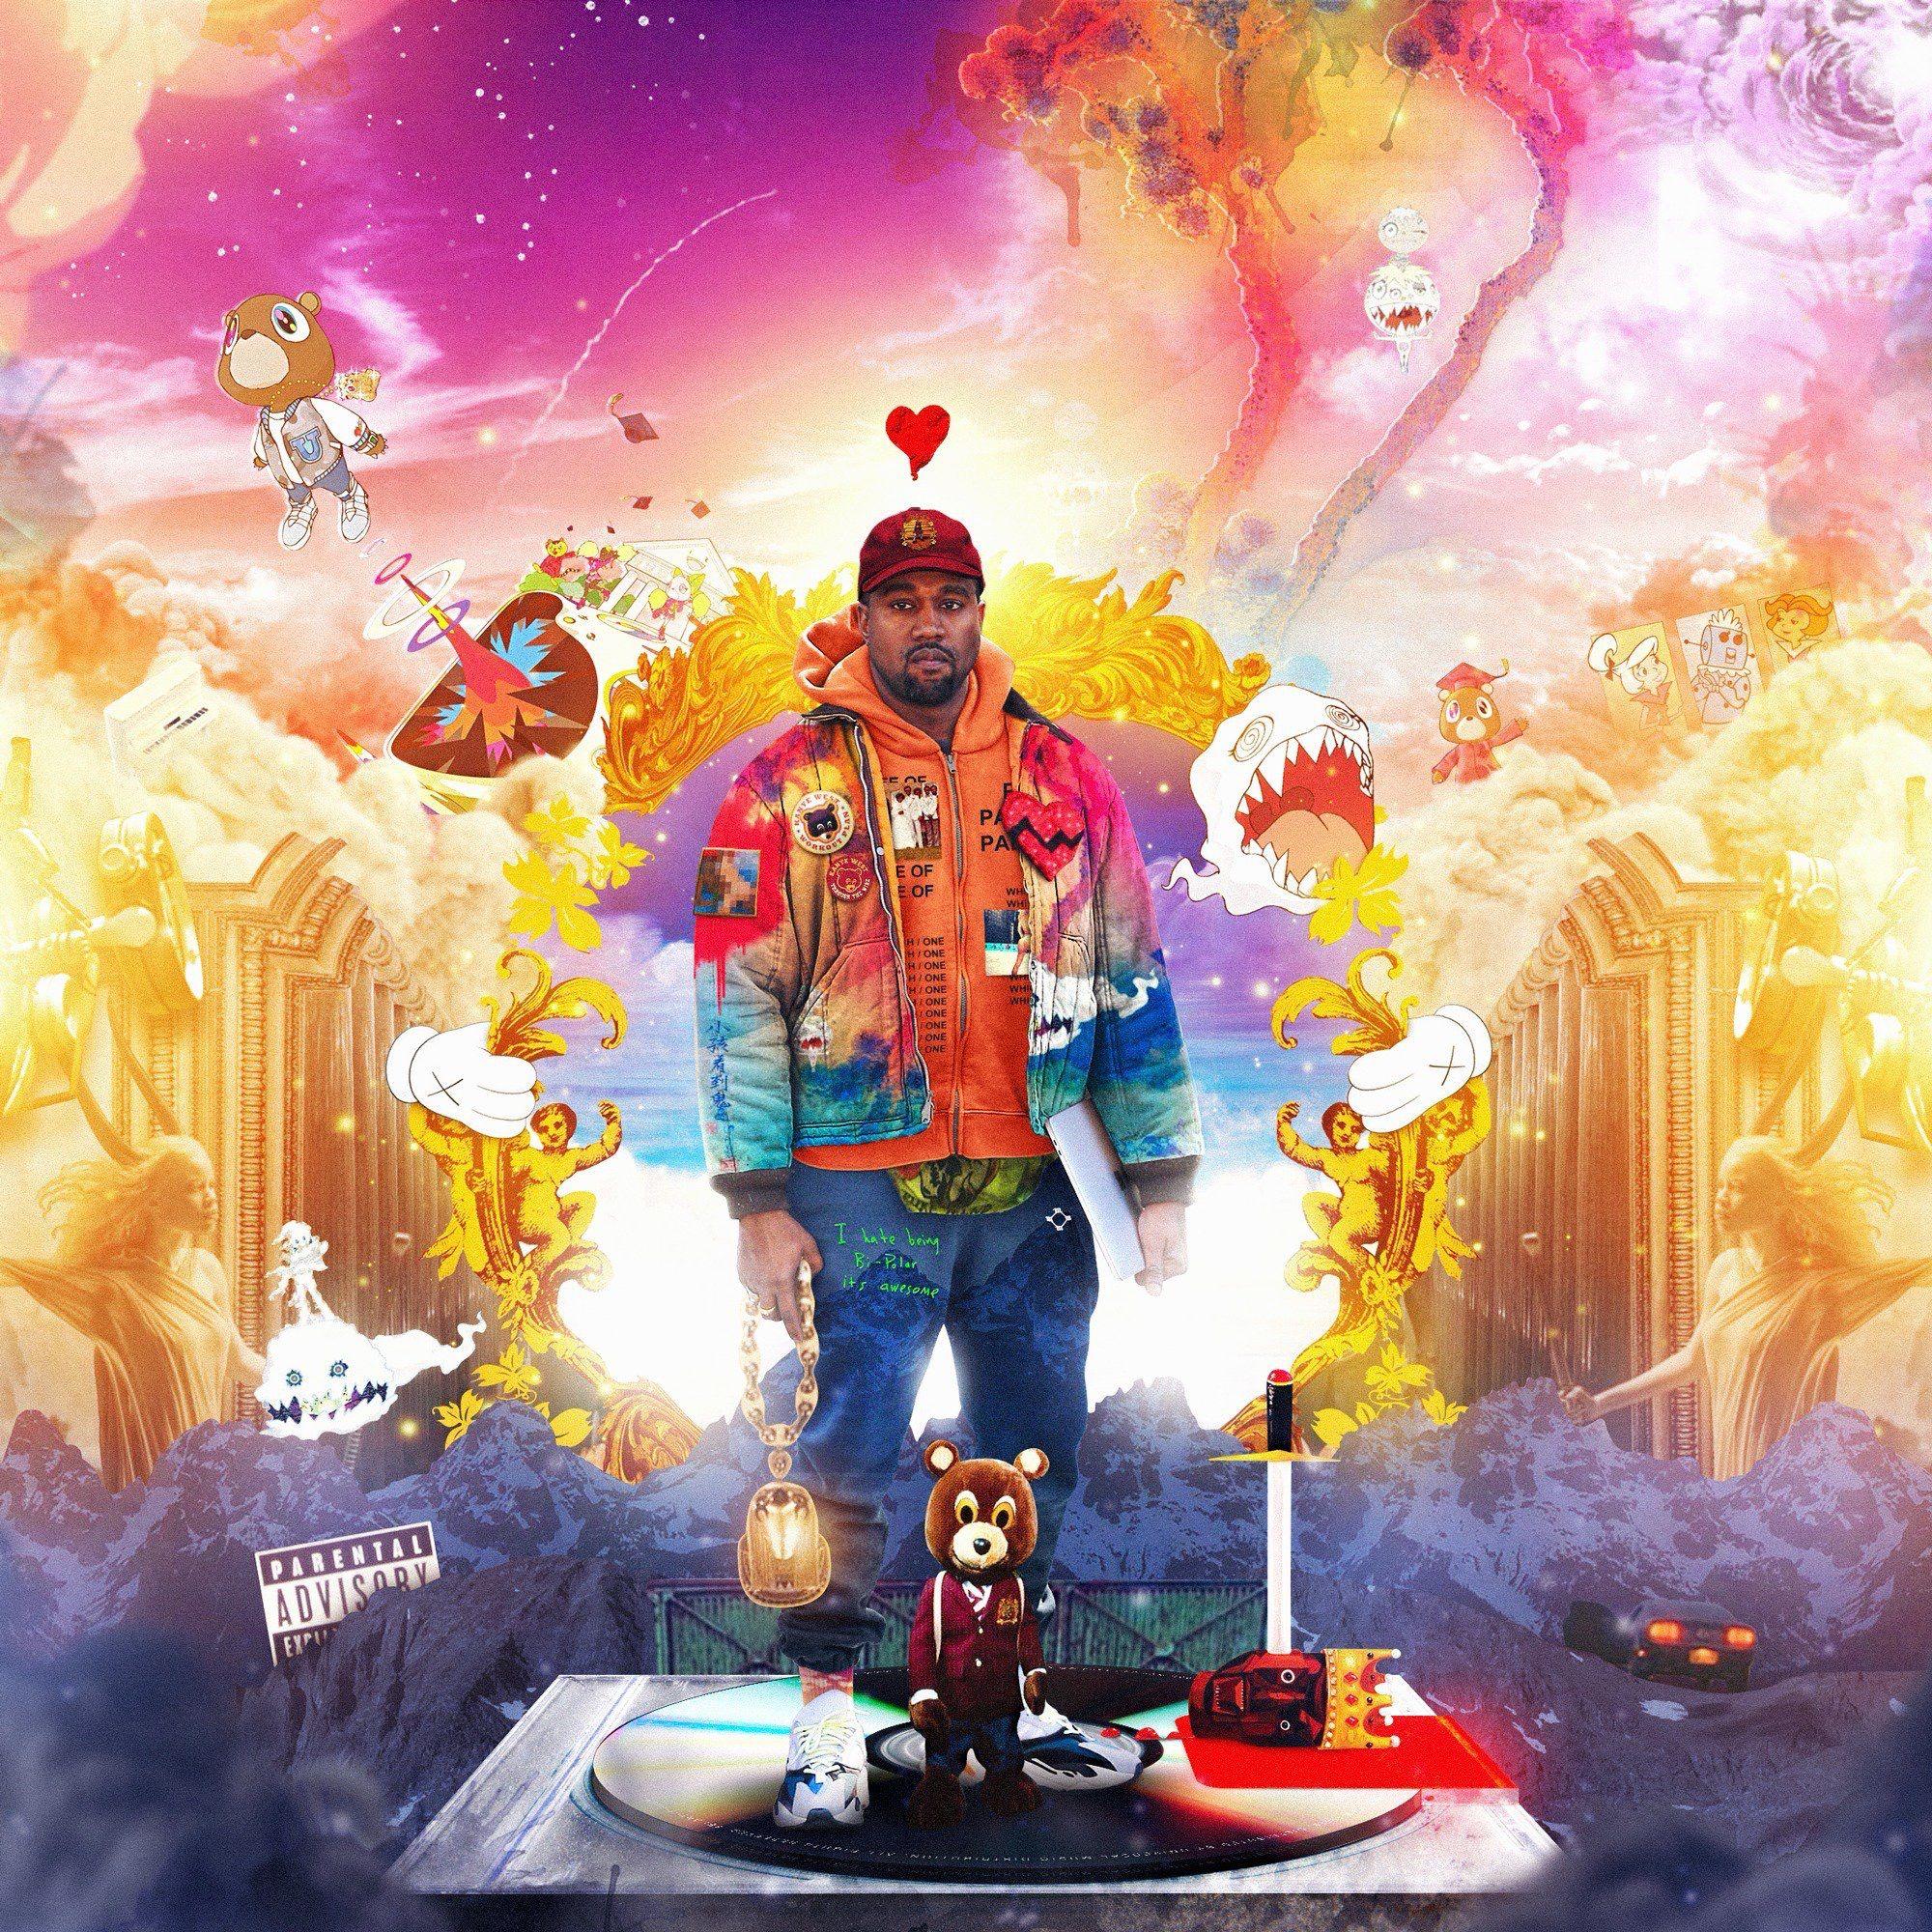 Kanye S Discography Kanye West Album Cover Kanye West Albums Kanye West Wallpaper